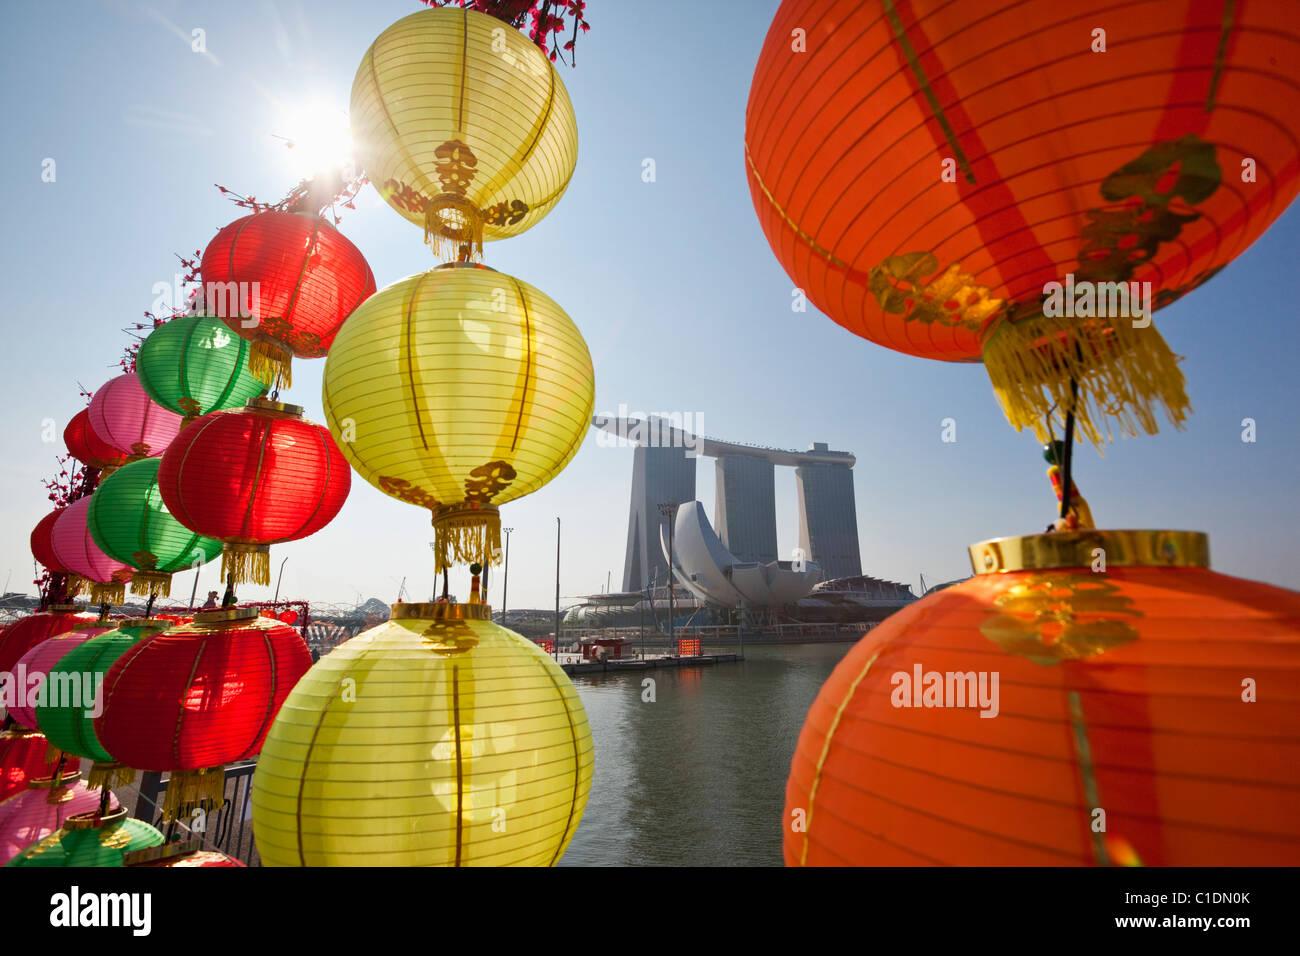 The Marina Bay Sands Singapore viewed through Chinese New Year decorations.  Marina Bay, Singapore - Stock Image